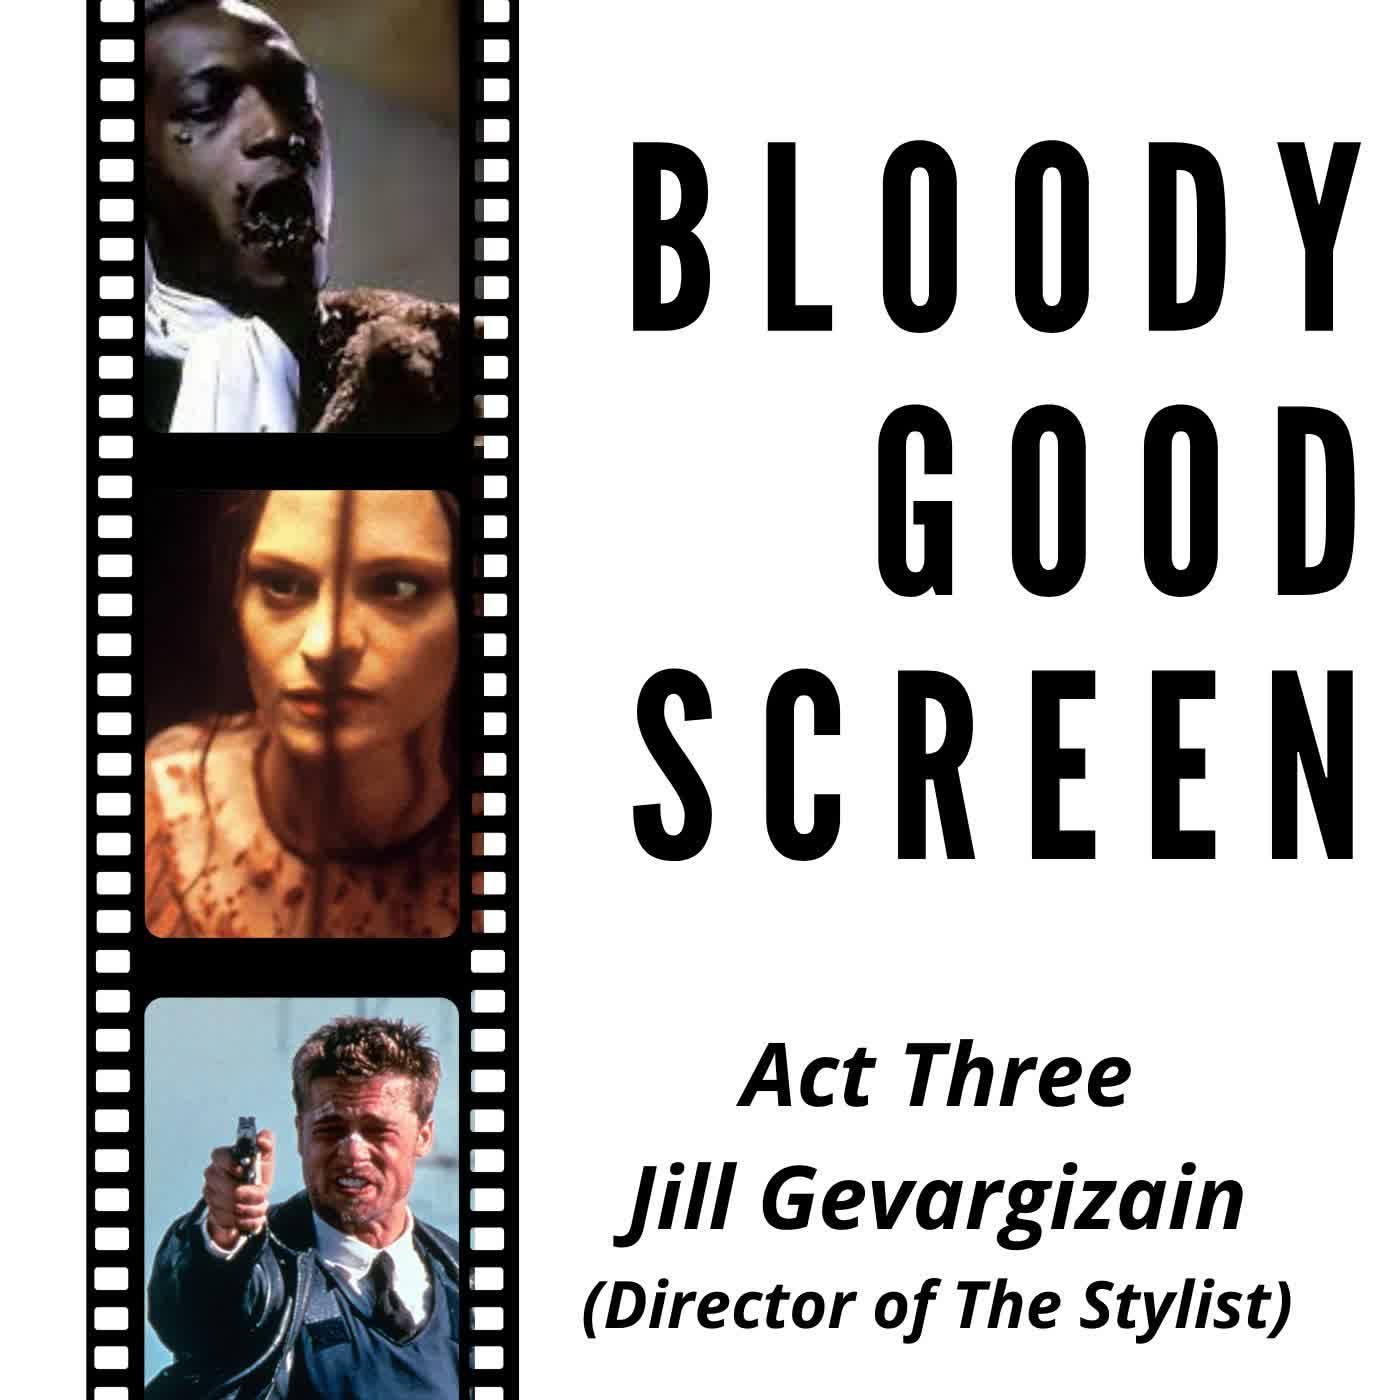 Bloody Good Screen -Act 3 - Jill Gevargizian (Director of The Stylist)